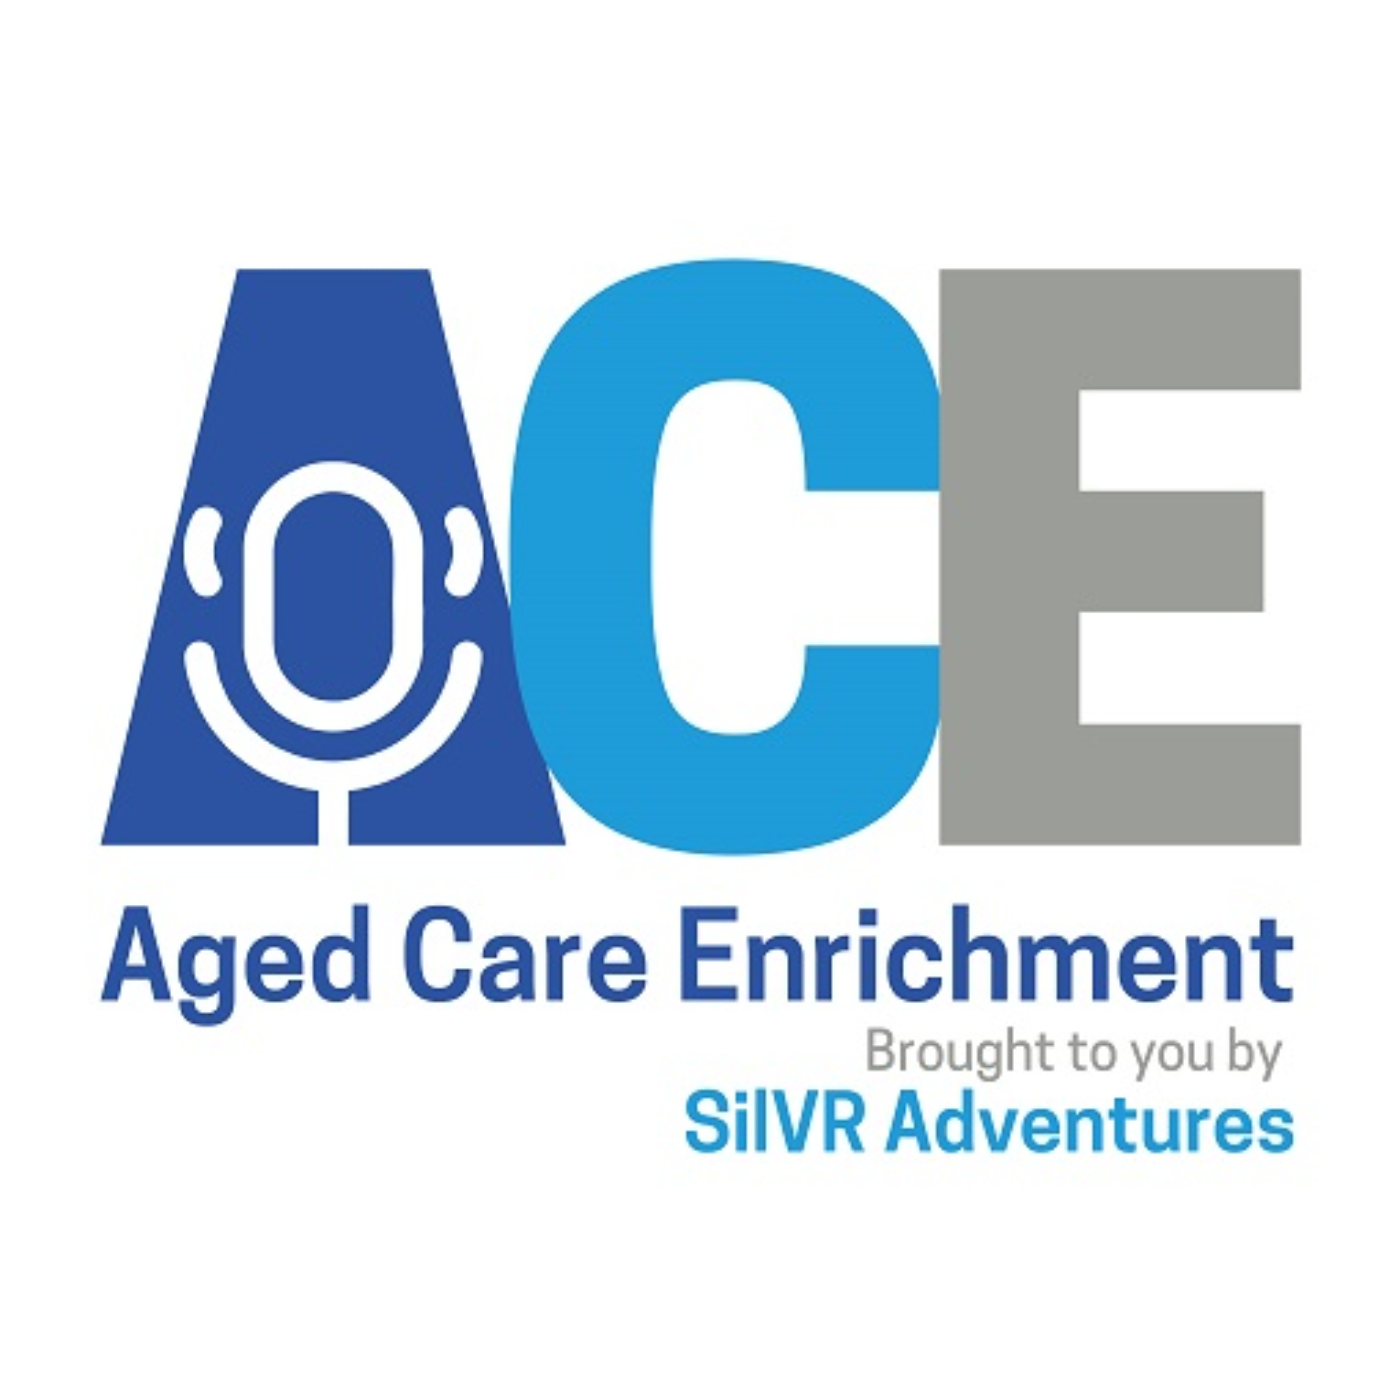 Show artwork for ACE - Aged Care Enrichment